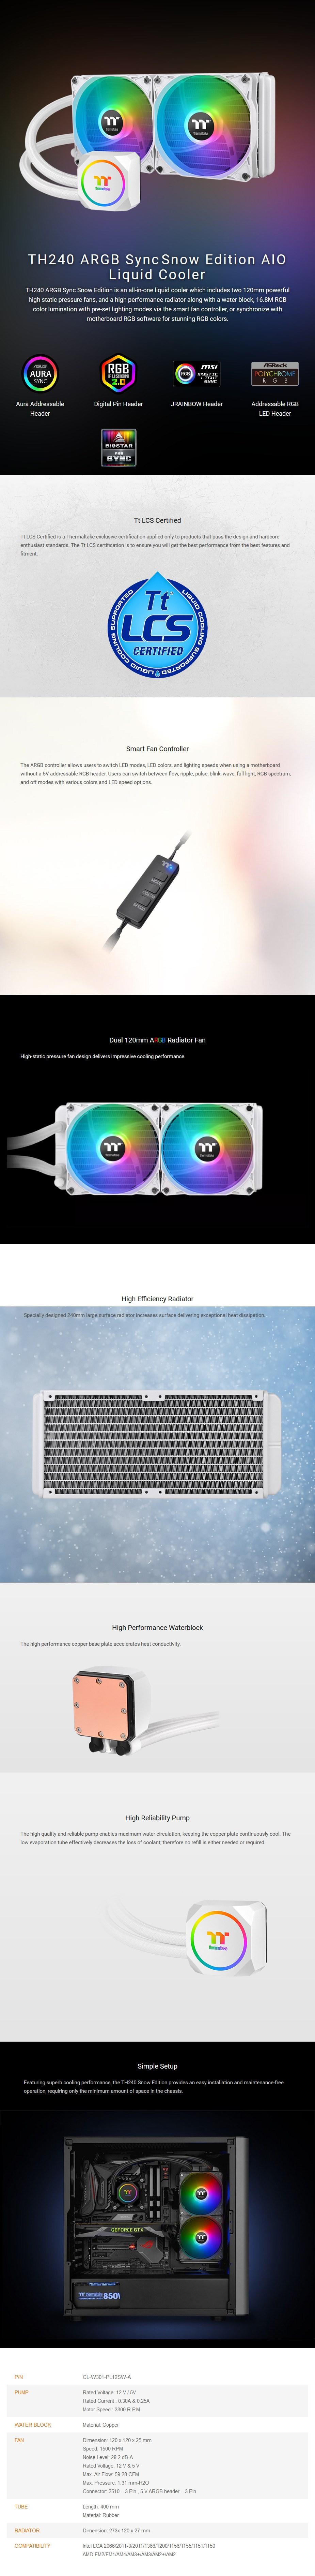 Thermaltake TH240 ARGB Sync AIO Liquid CPU Cooler - Snow Edition - Overview 1